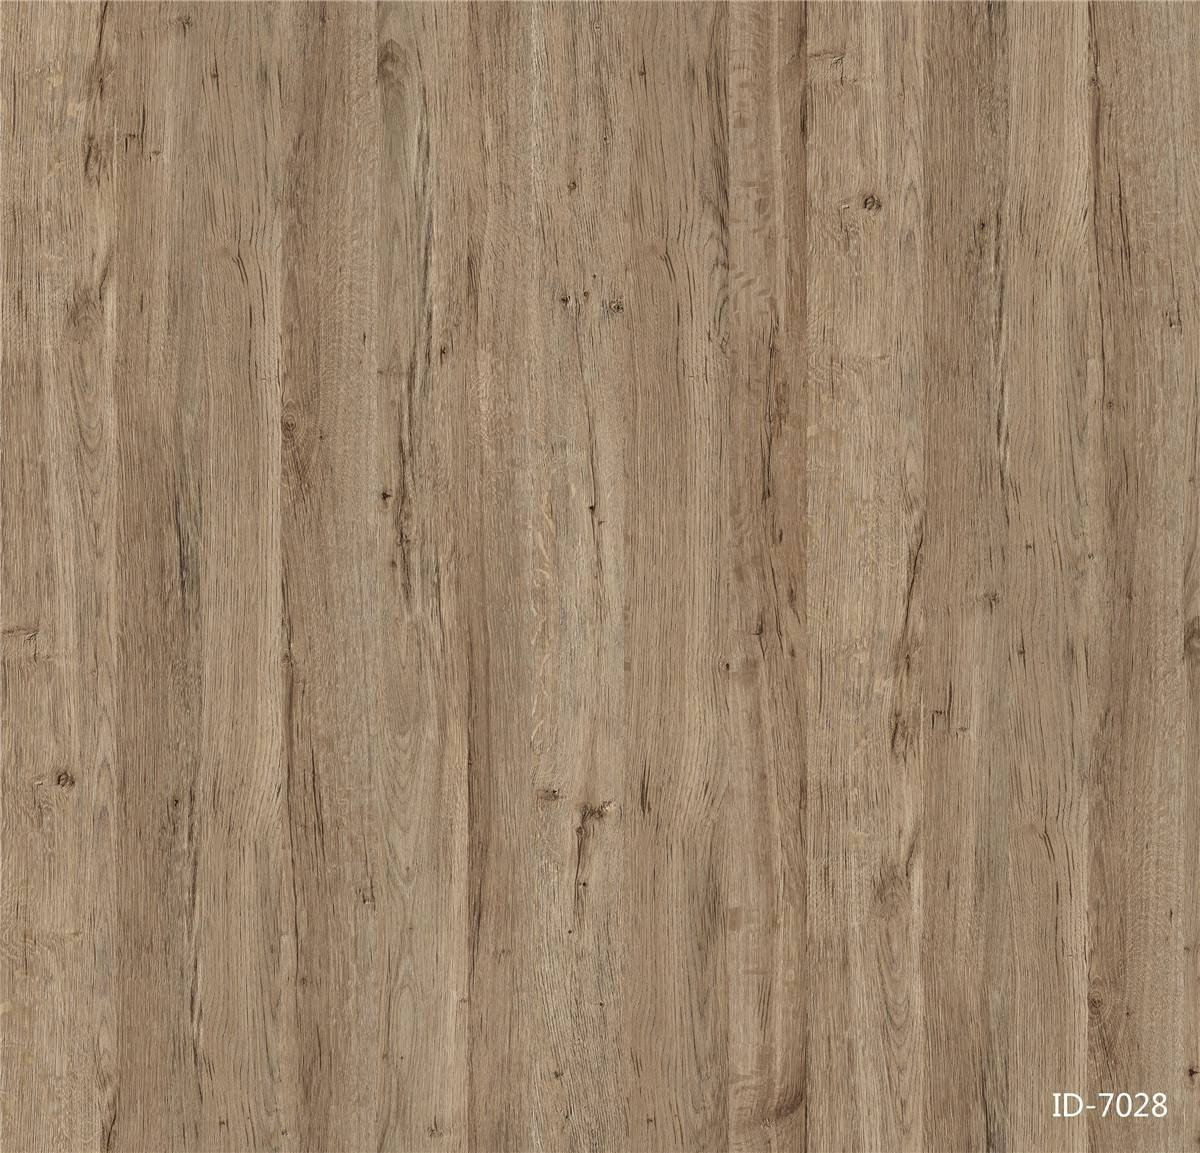 I.DECOR ID7028 decor paper oak idecor ID Series 2017 image55